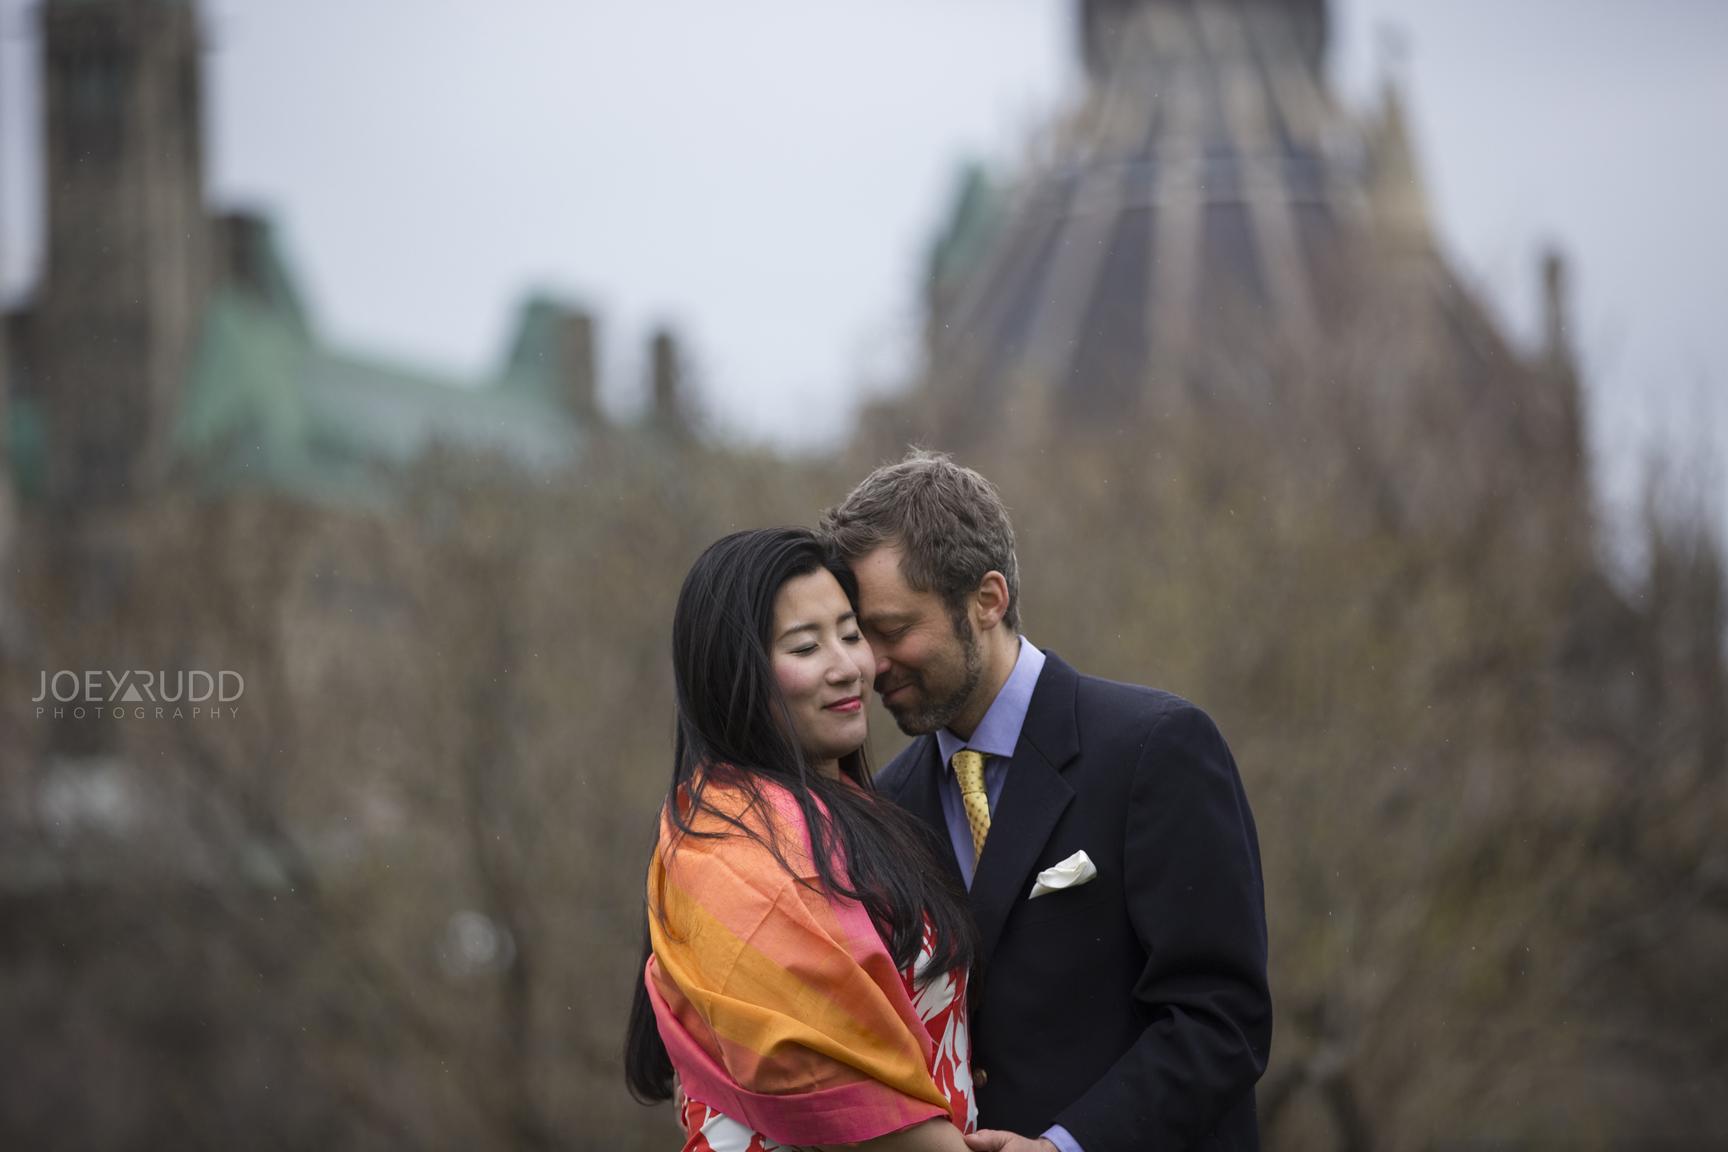 Ottawa Elopement Wedding Photographer Joey Rudd Photography Chateau Laurier